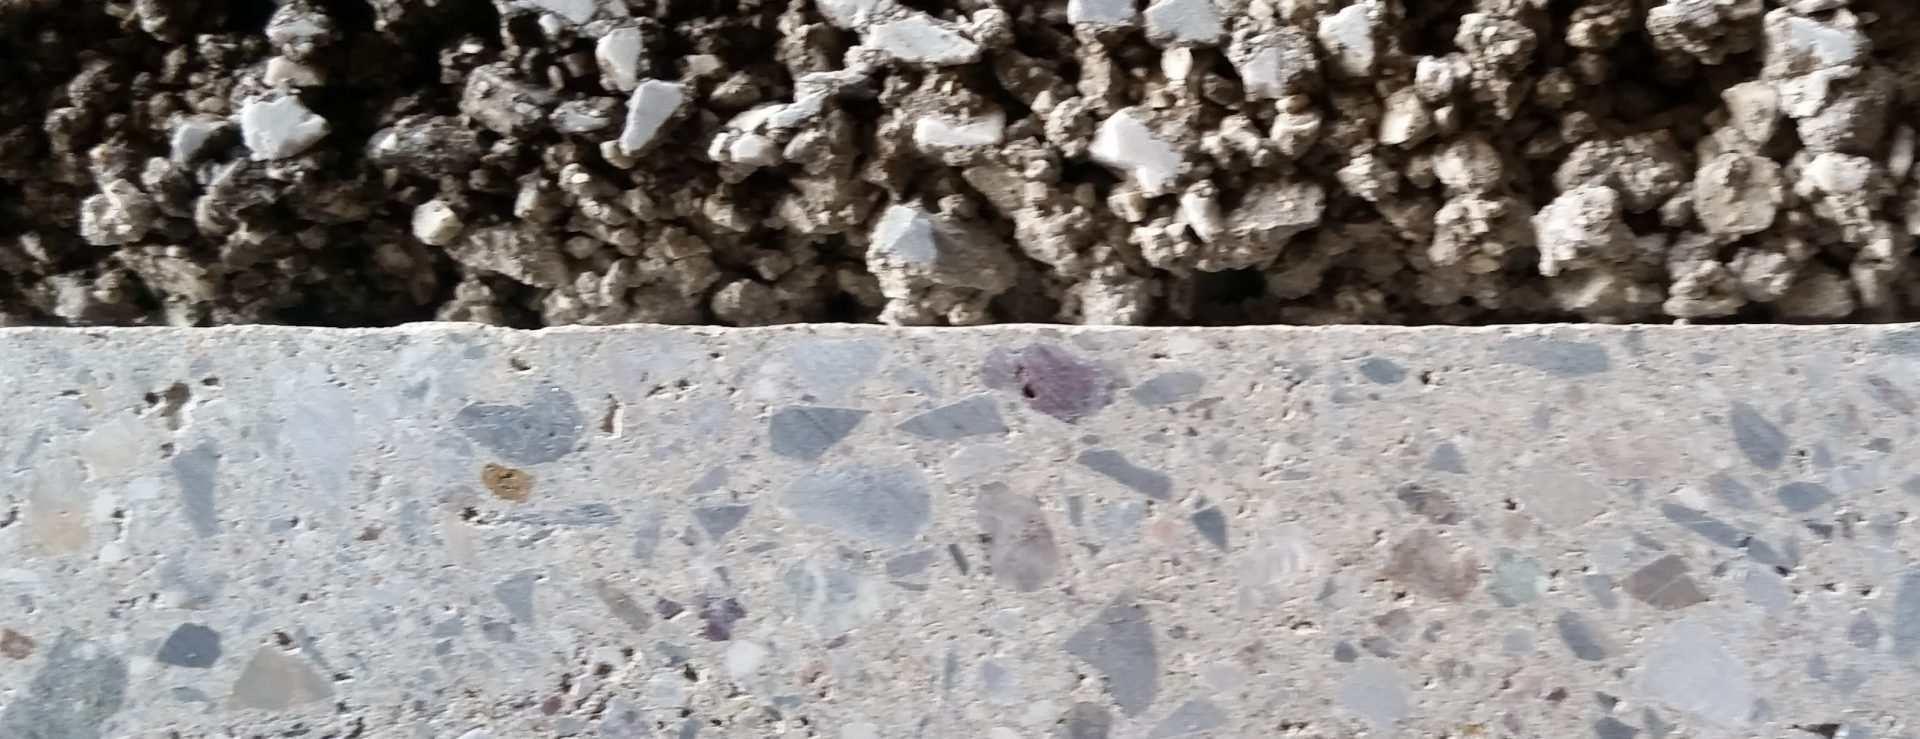 Razlika v prerezu tlaka in betona ozka